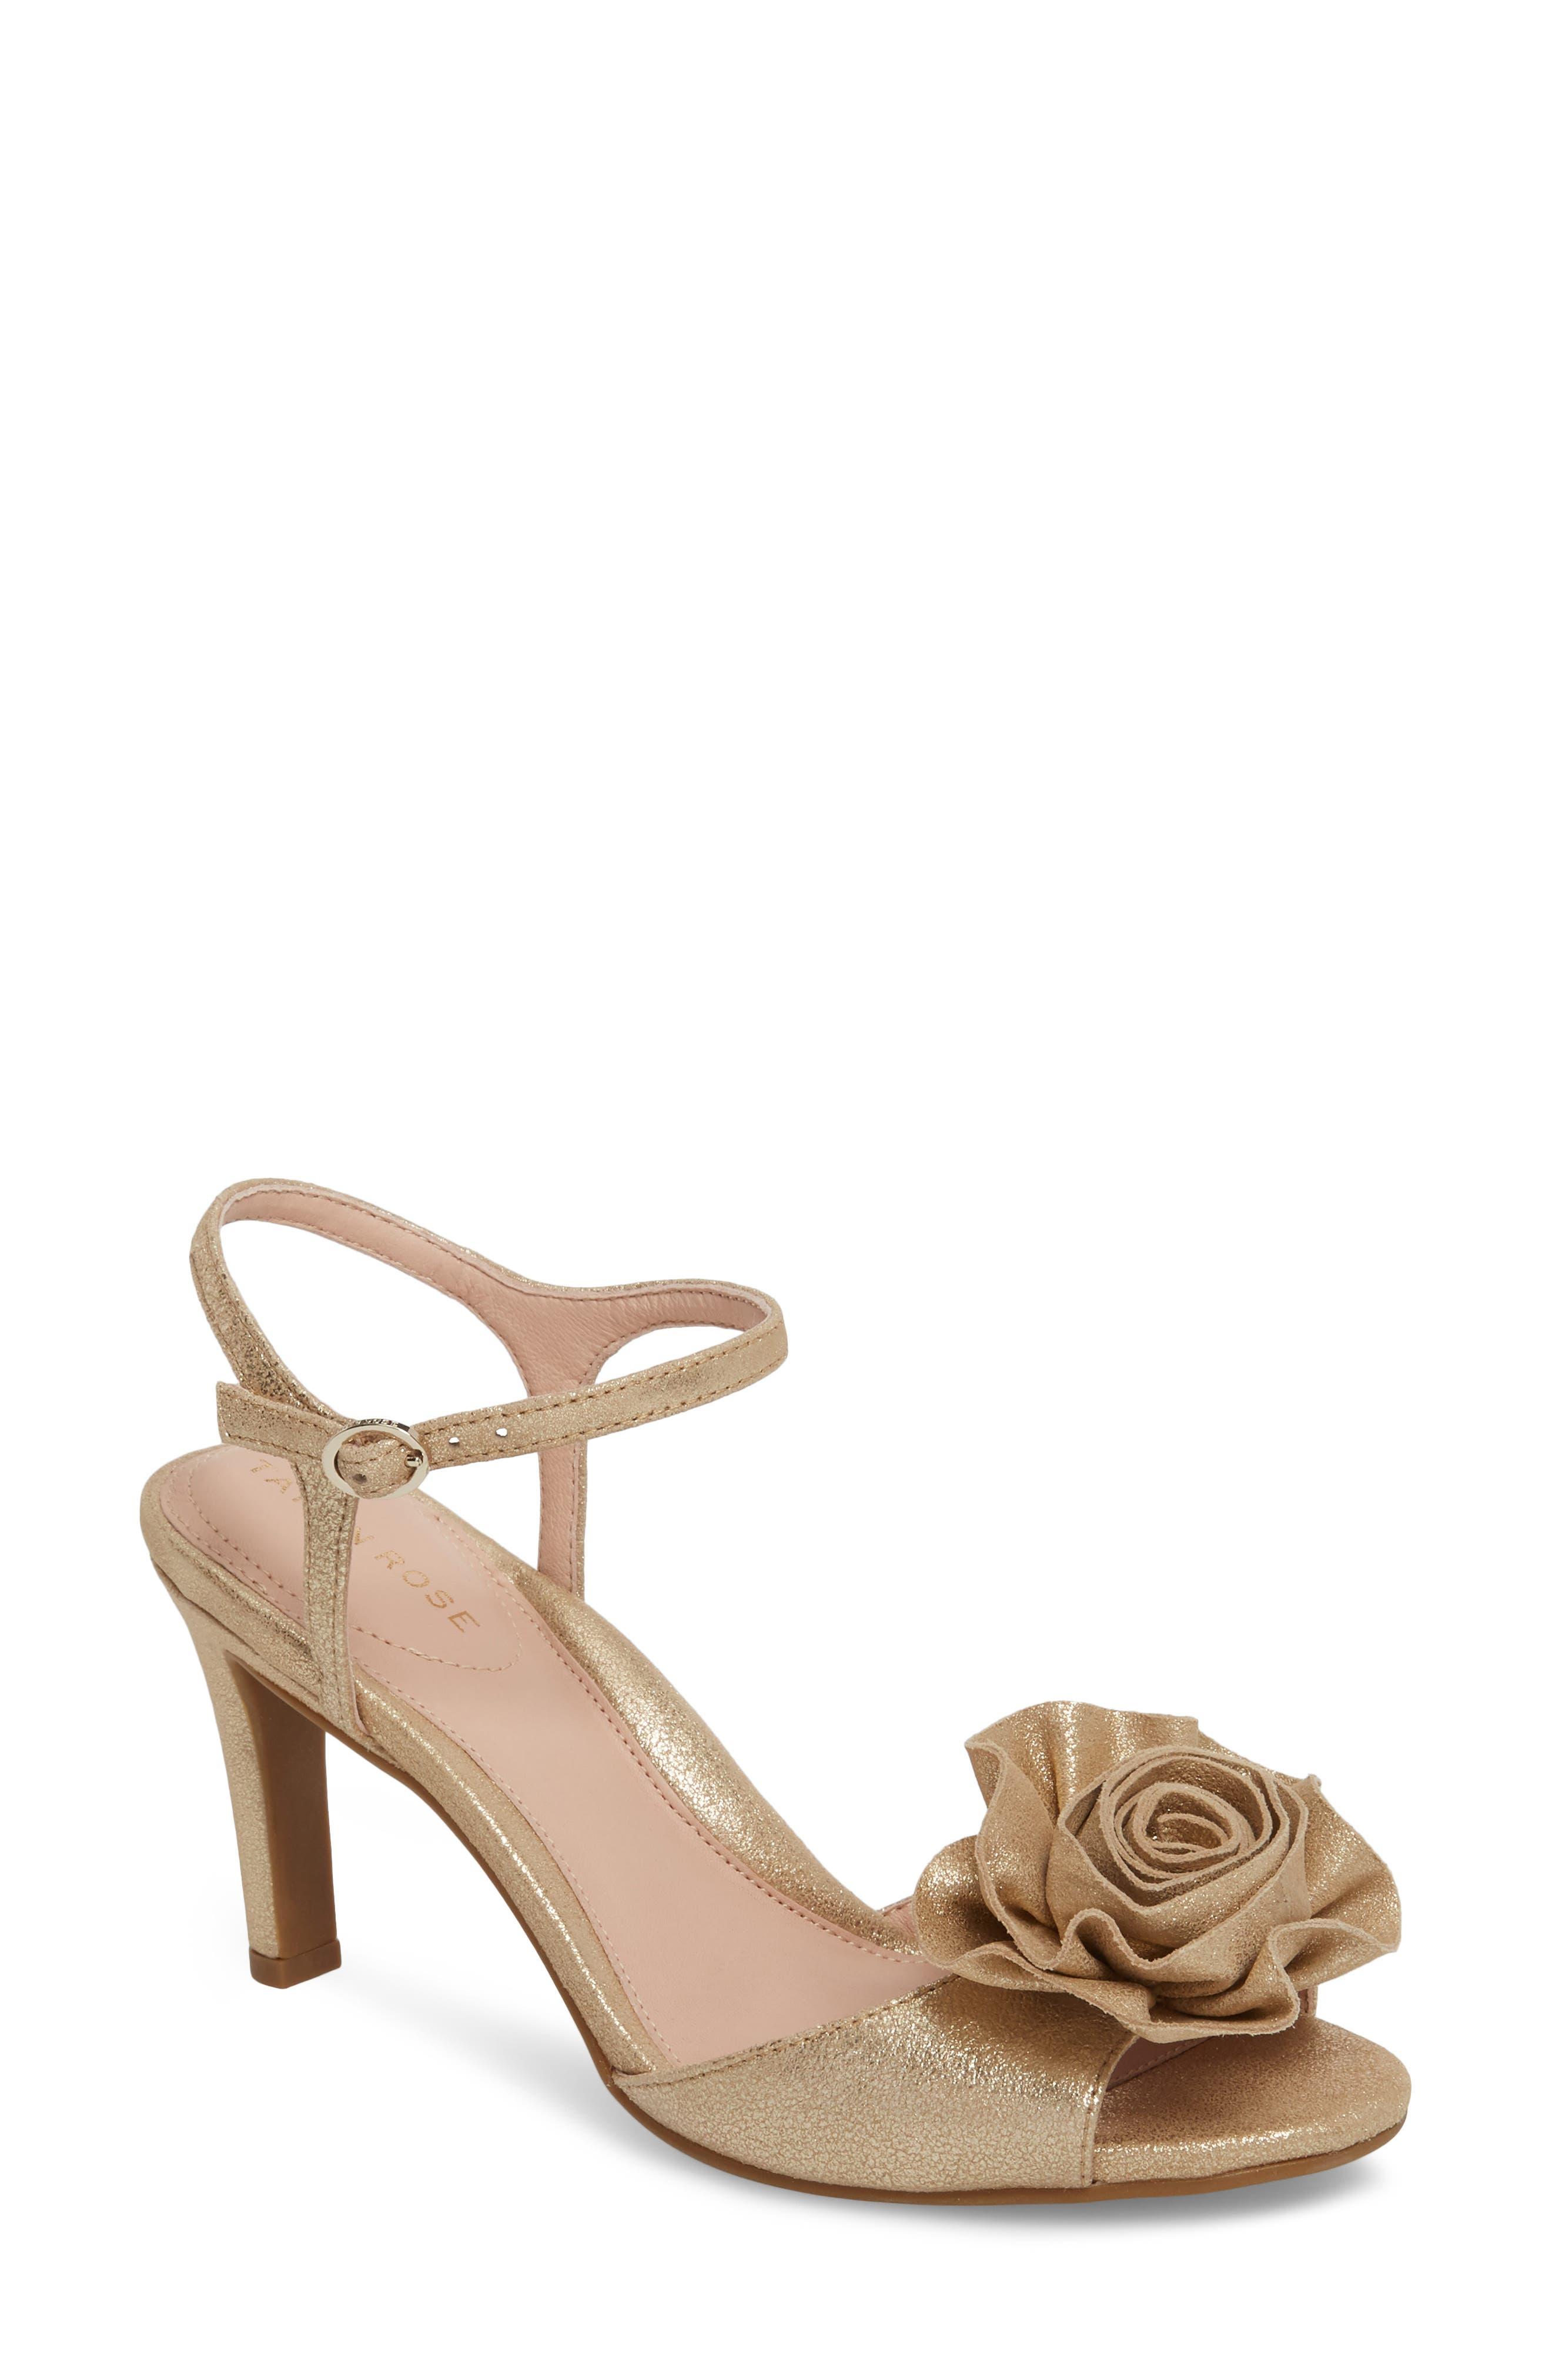 TARYN ROSE,                             Jacklyn Flower Sandal,                             Main thumbnail 1, color,                             GOLD SHIMMER FABRIC